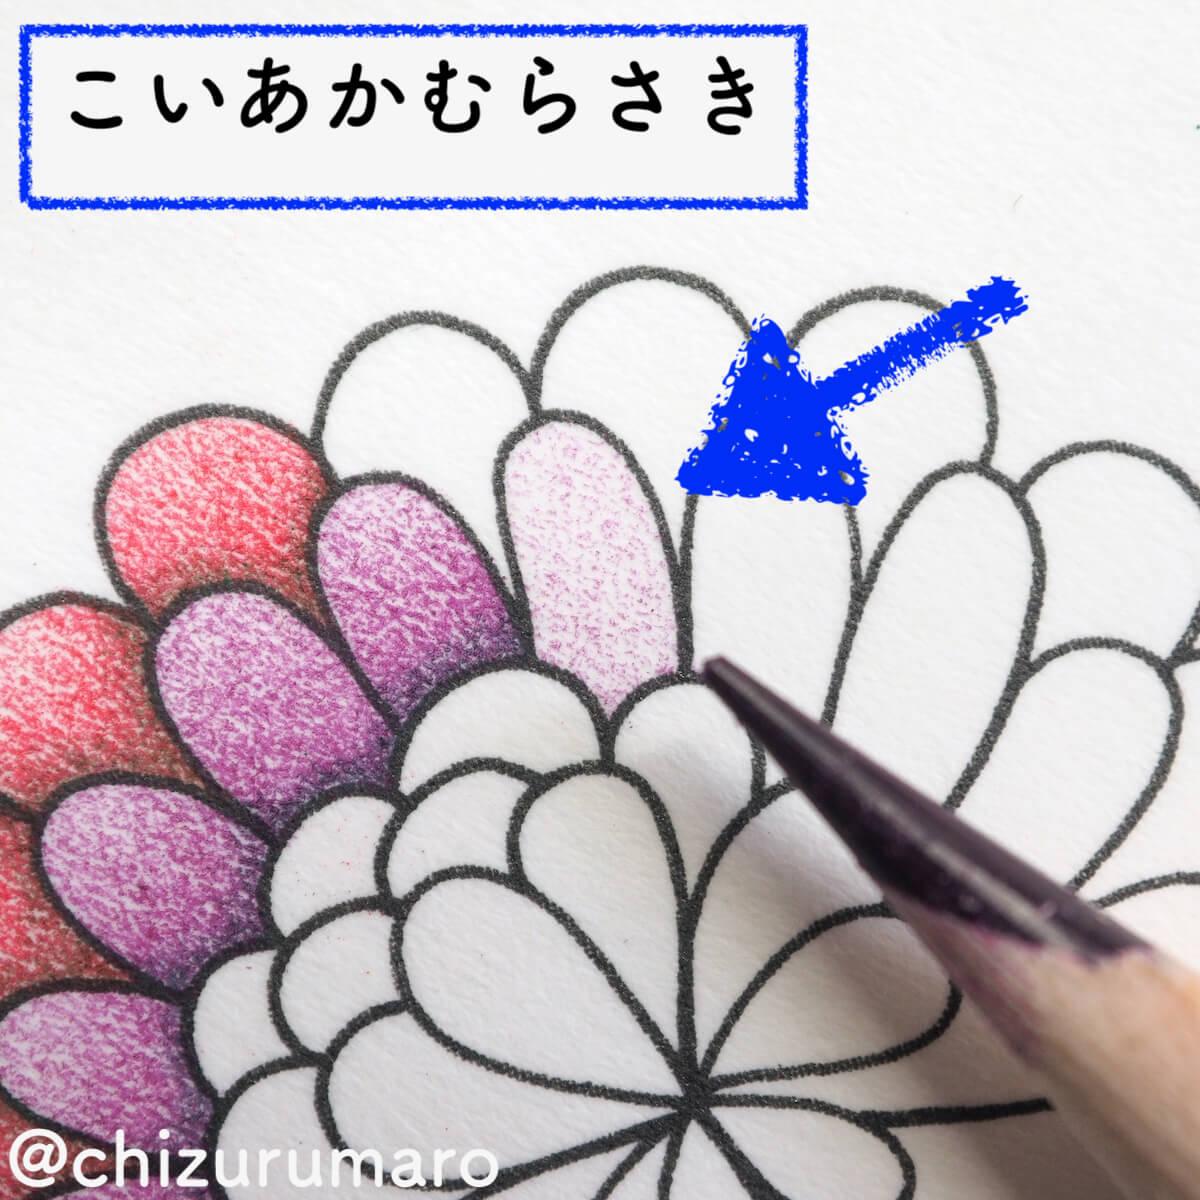 f:id:chizurumaro:20200326115038j:plain